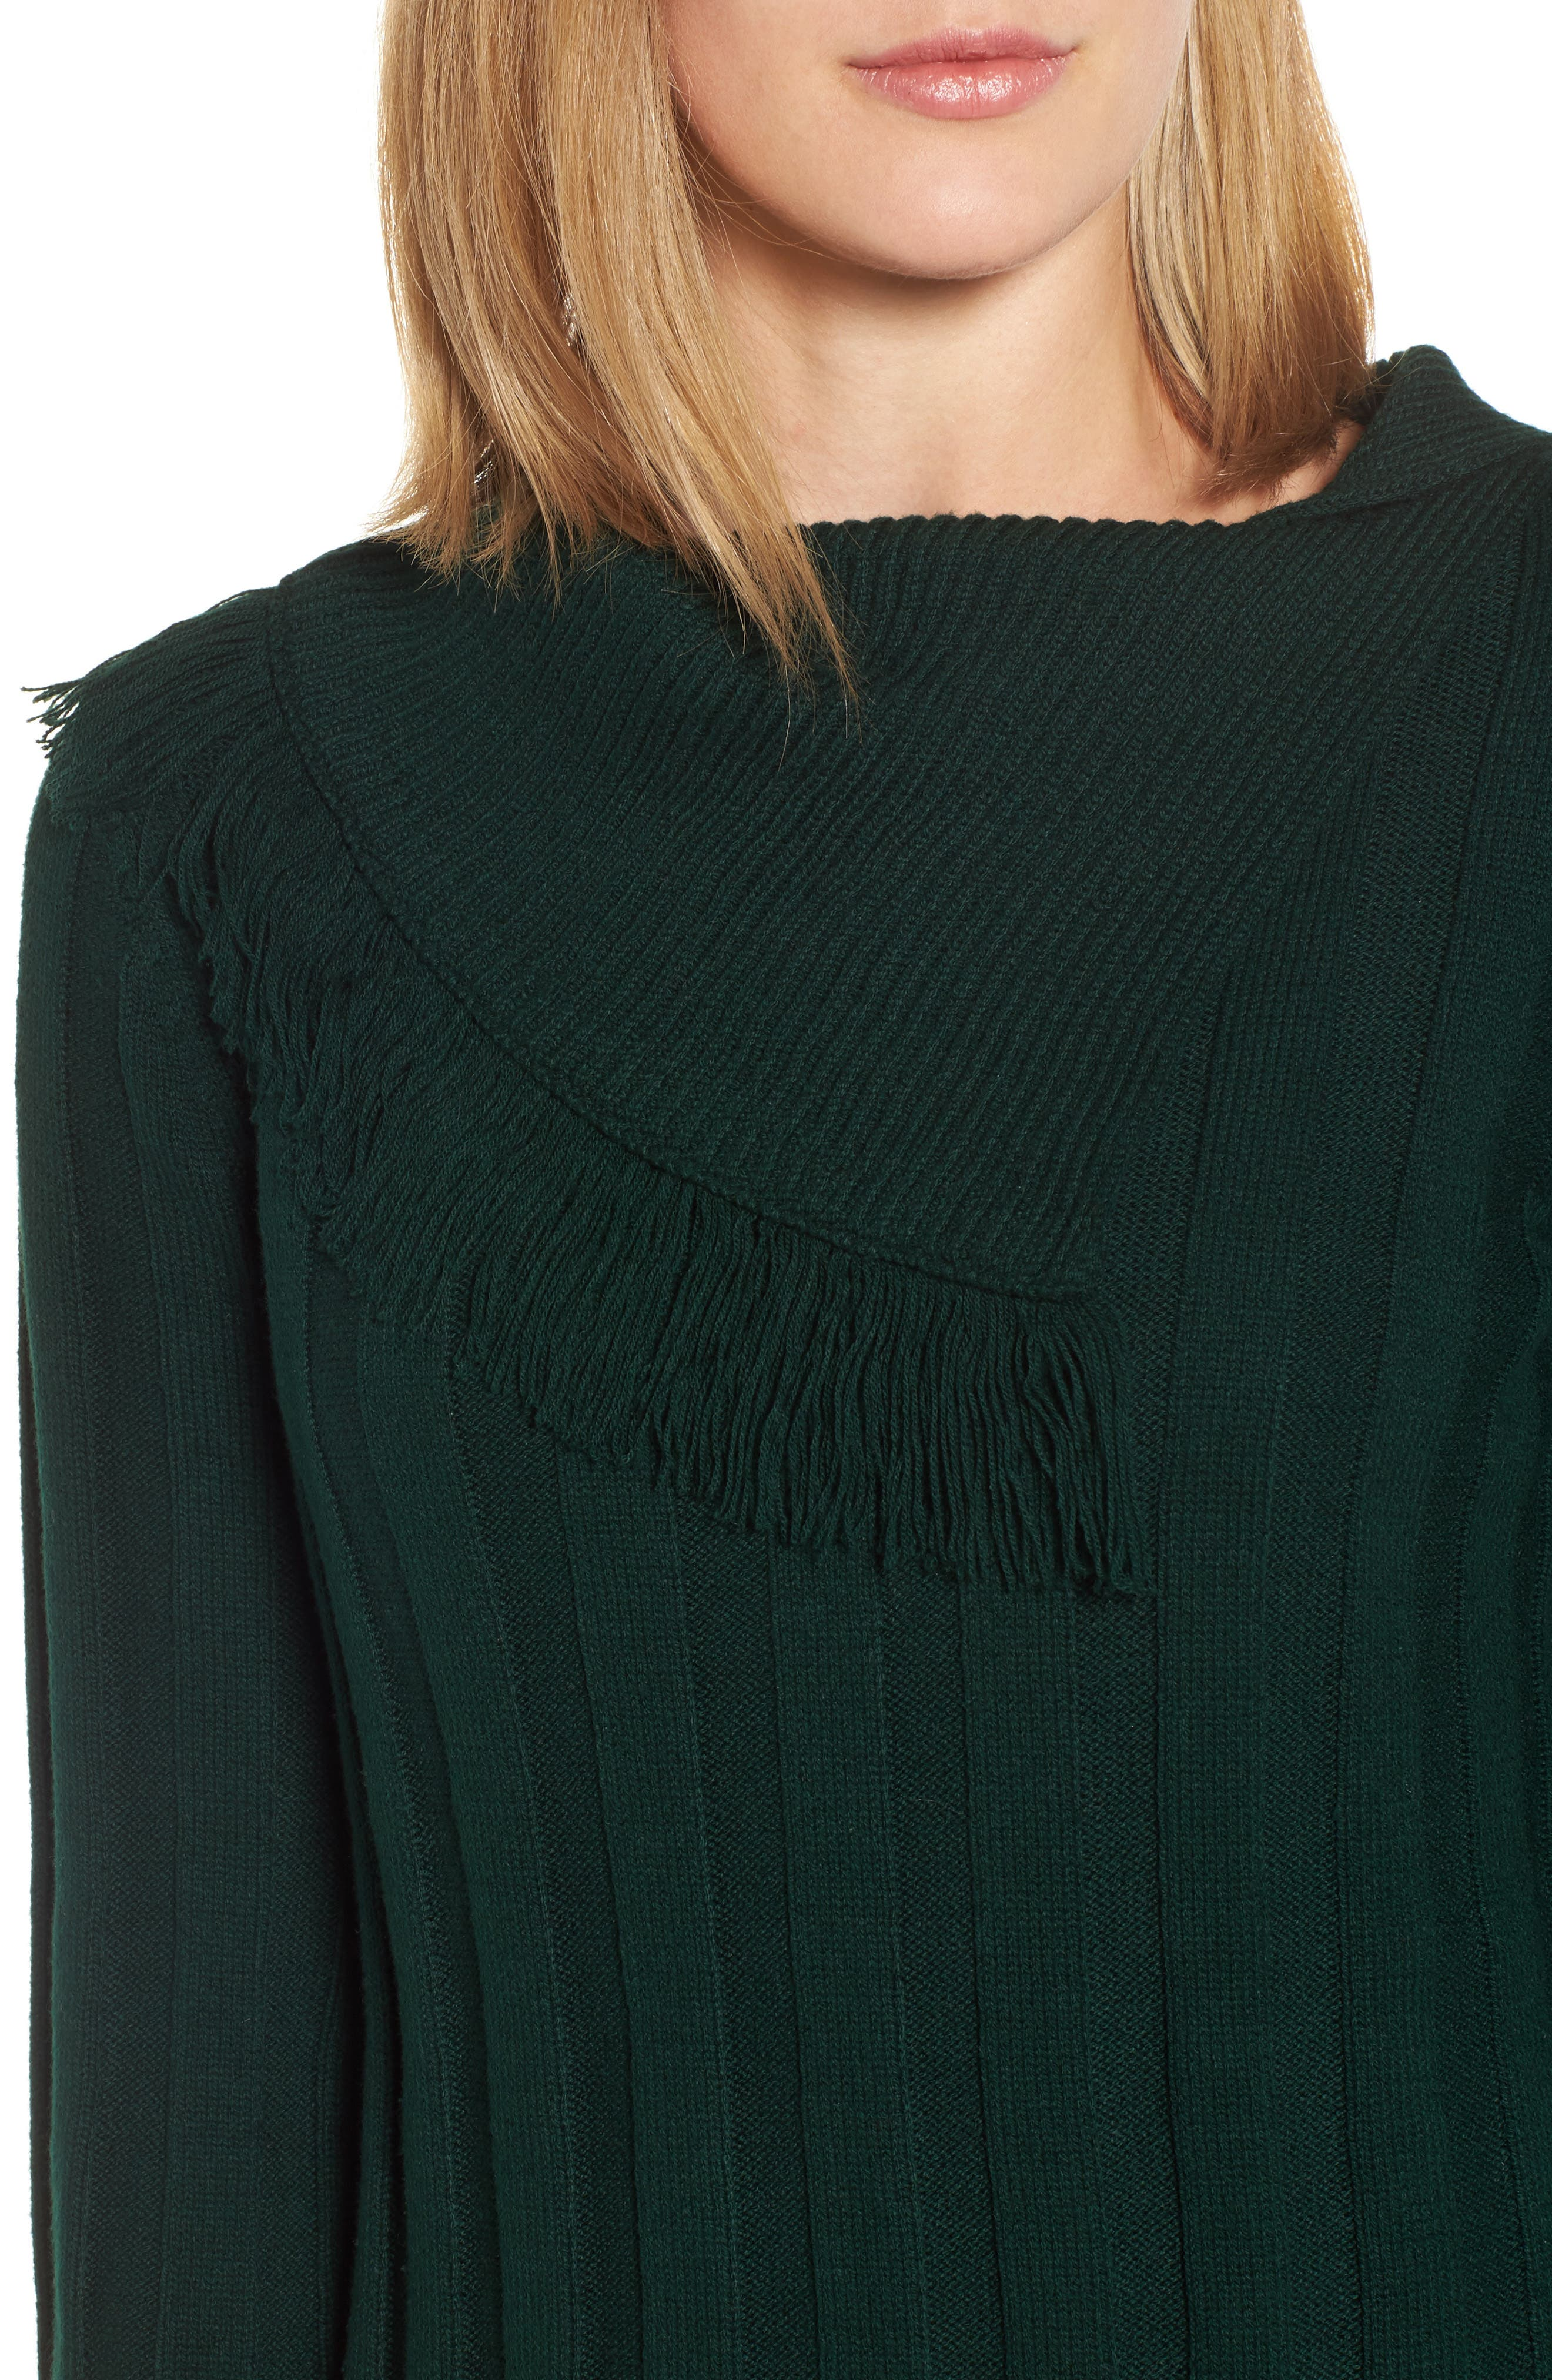 Fringe Cowl Neck Sweater,                             Alternate thumbnail 12, color,